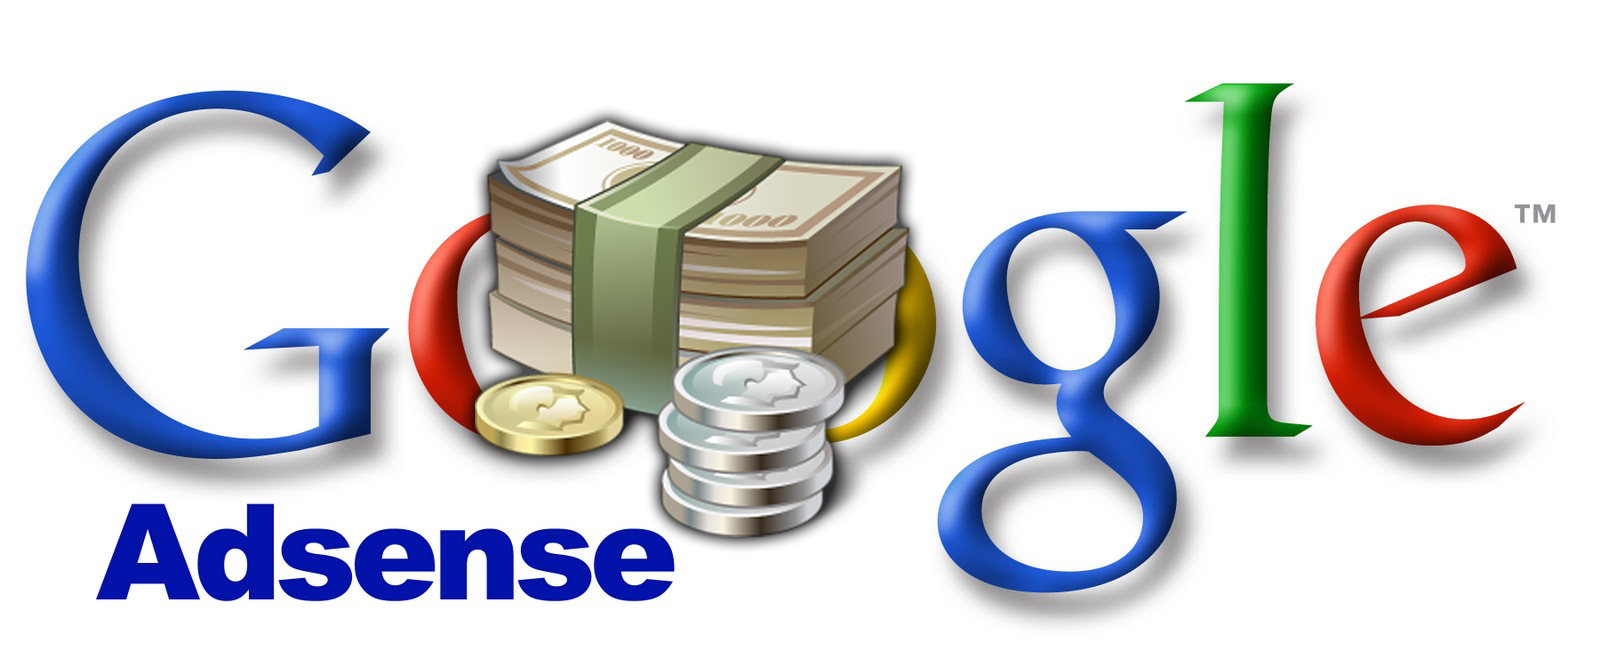 Cara mendapatkan duit dari Google Adsense